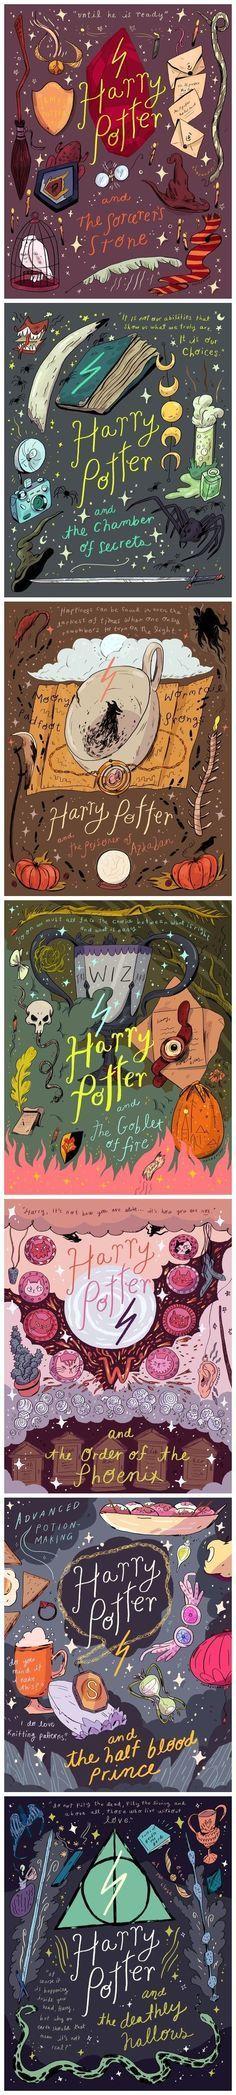 Harry Potter print Illustration by Natalie Andrews